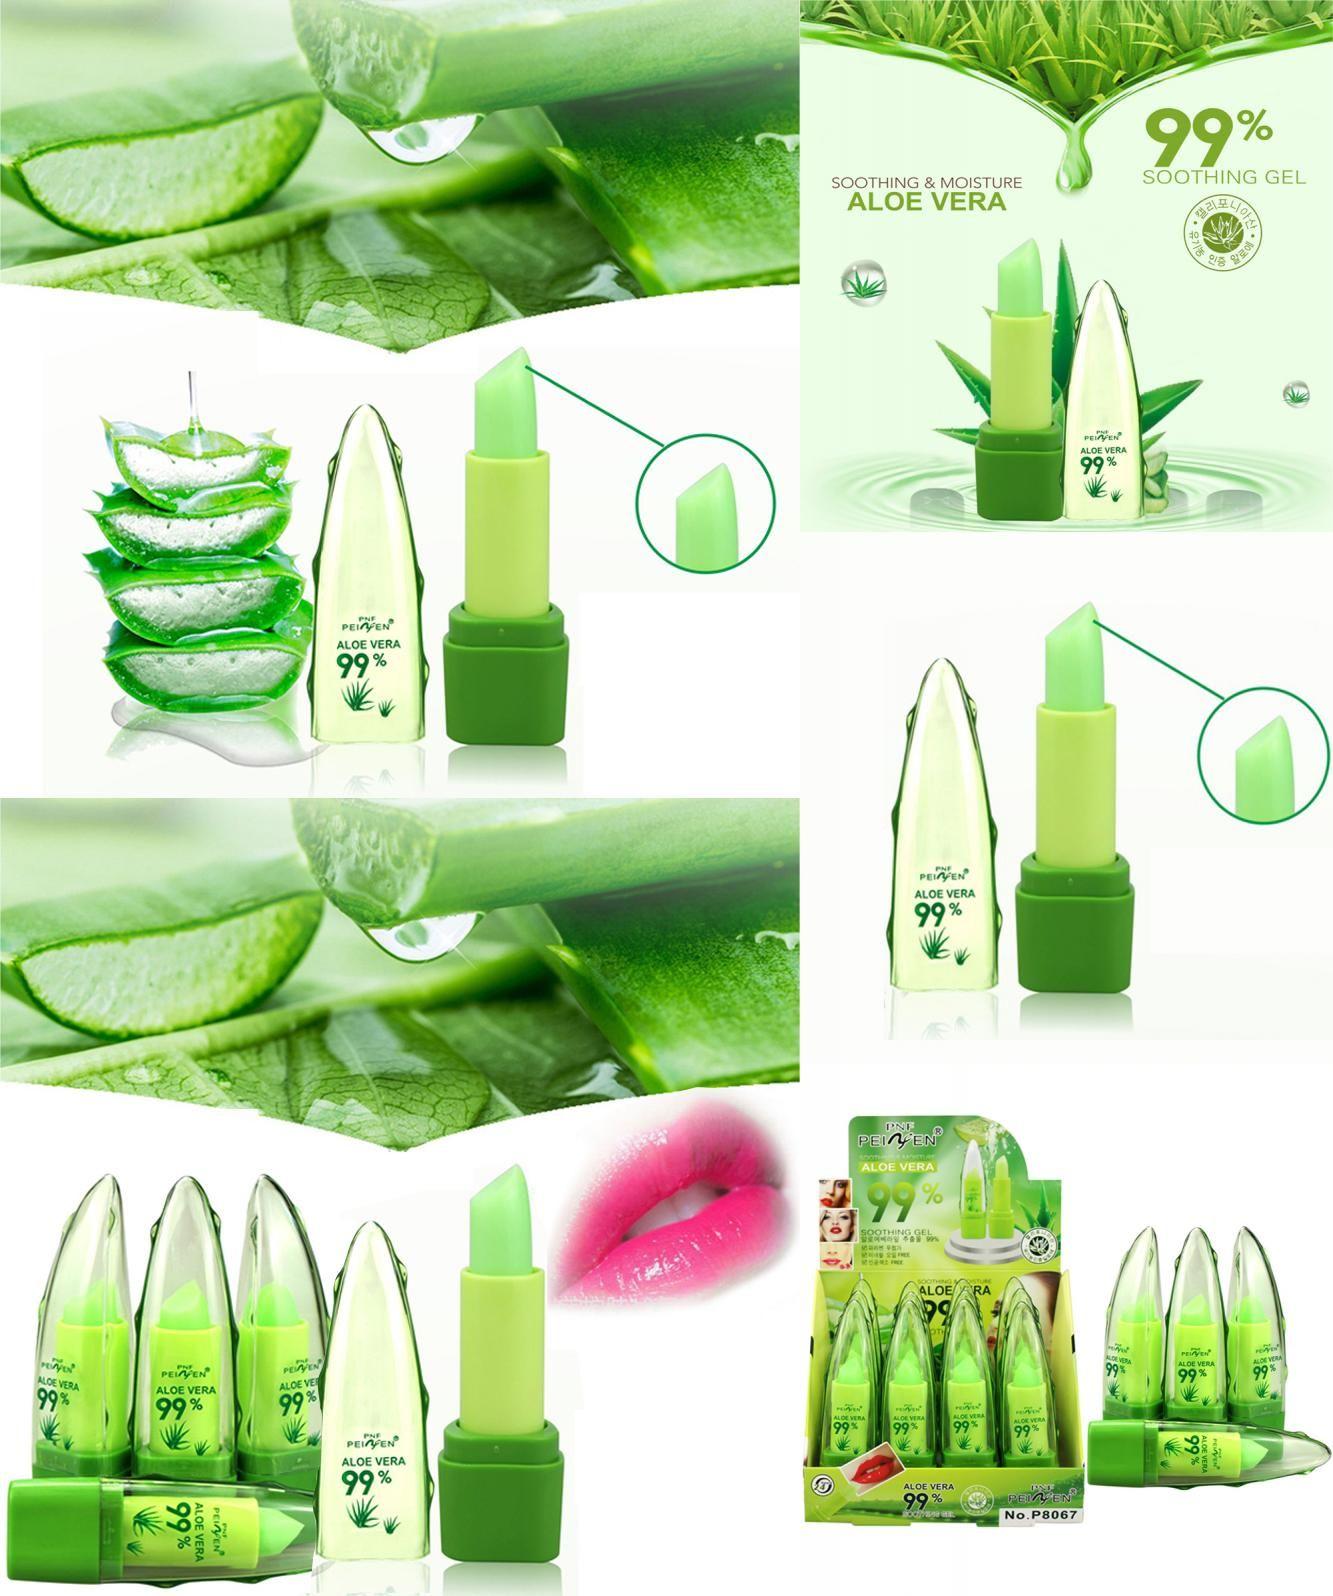 [Visit to Buy] High Quality 99 Aloe Vera Essence Lips